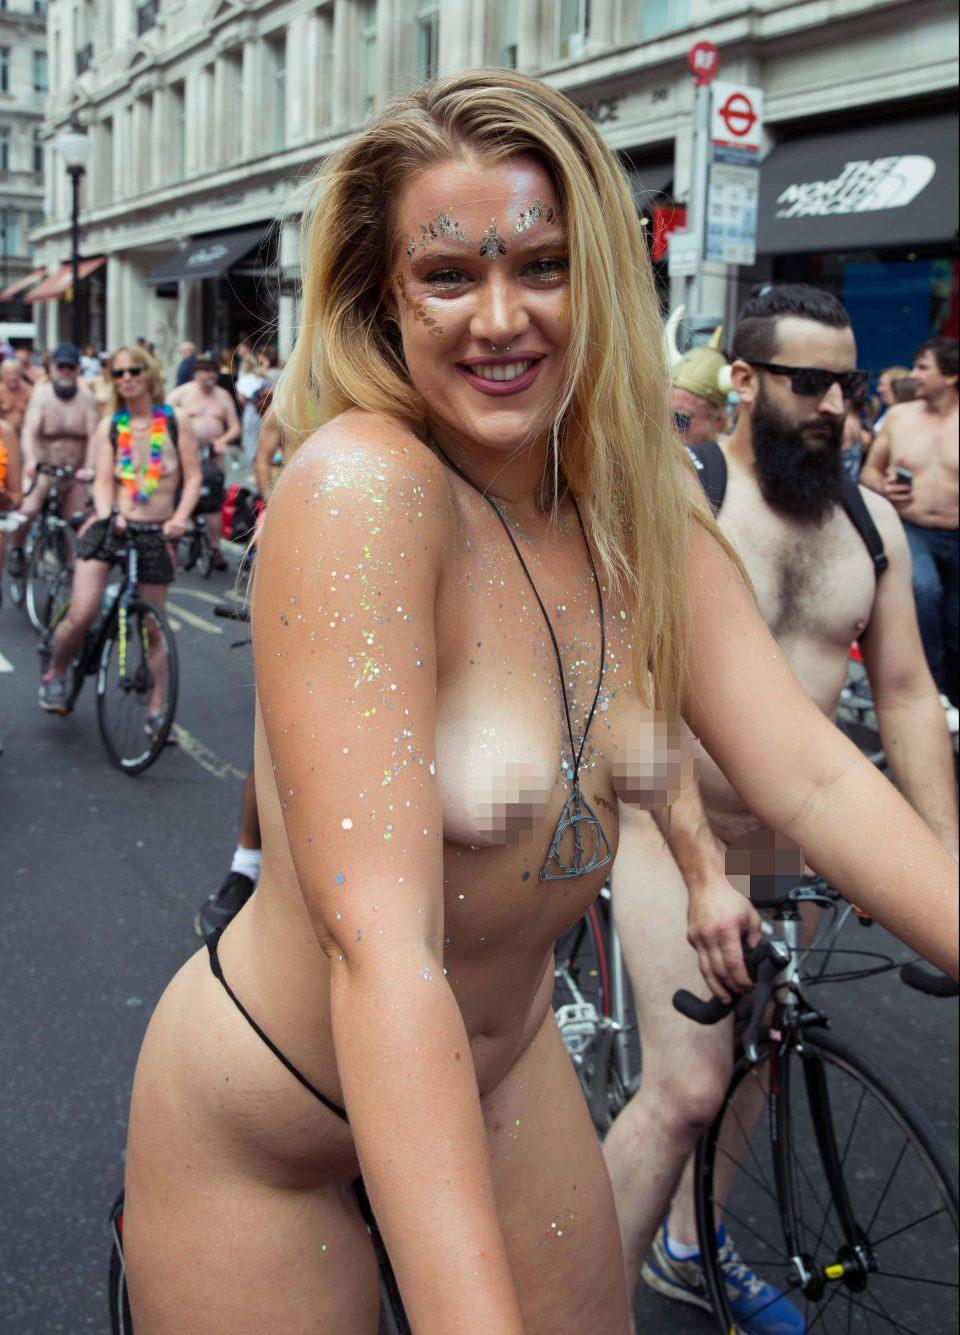 Naked ladies riding bicycles